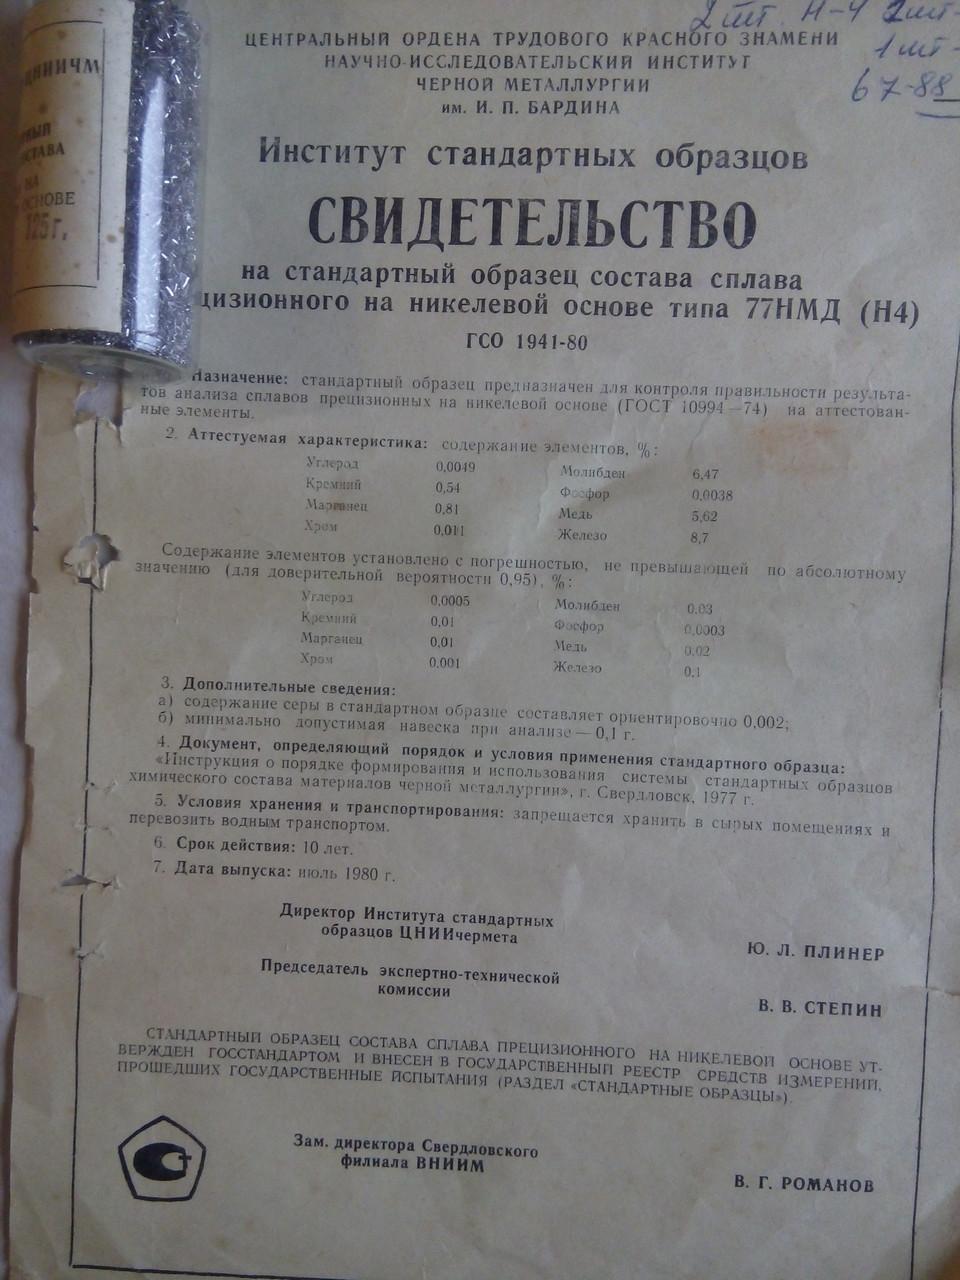 Образец  (Н 4) сплава на Никелевой основе  77НМД ГСО 1941-80П